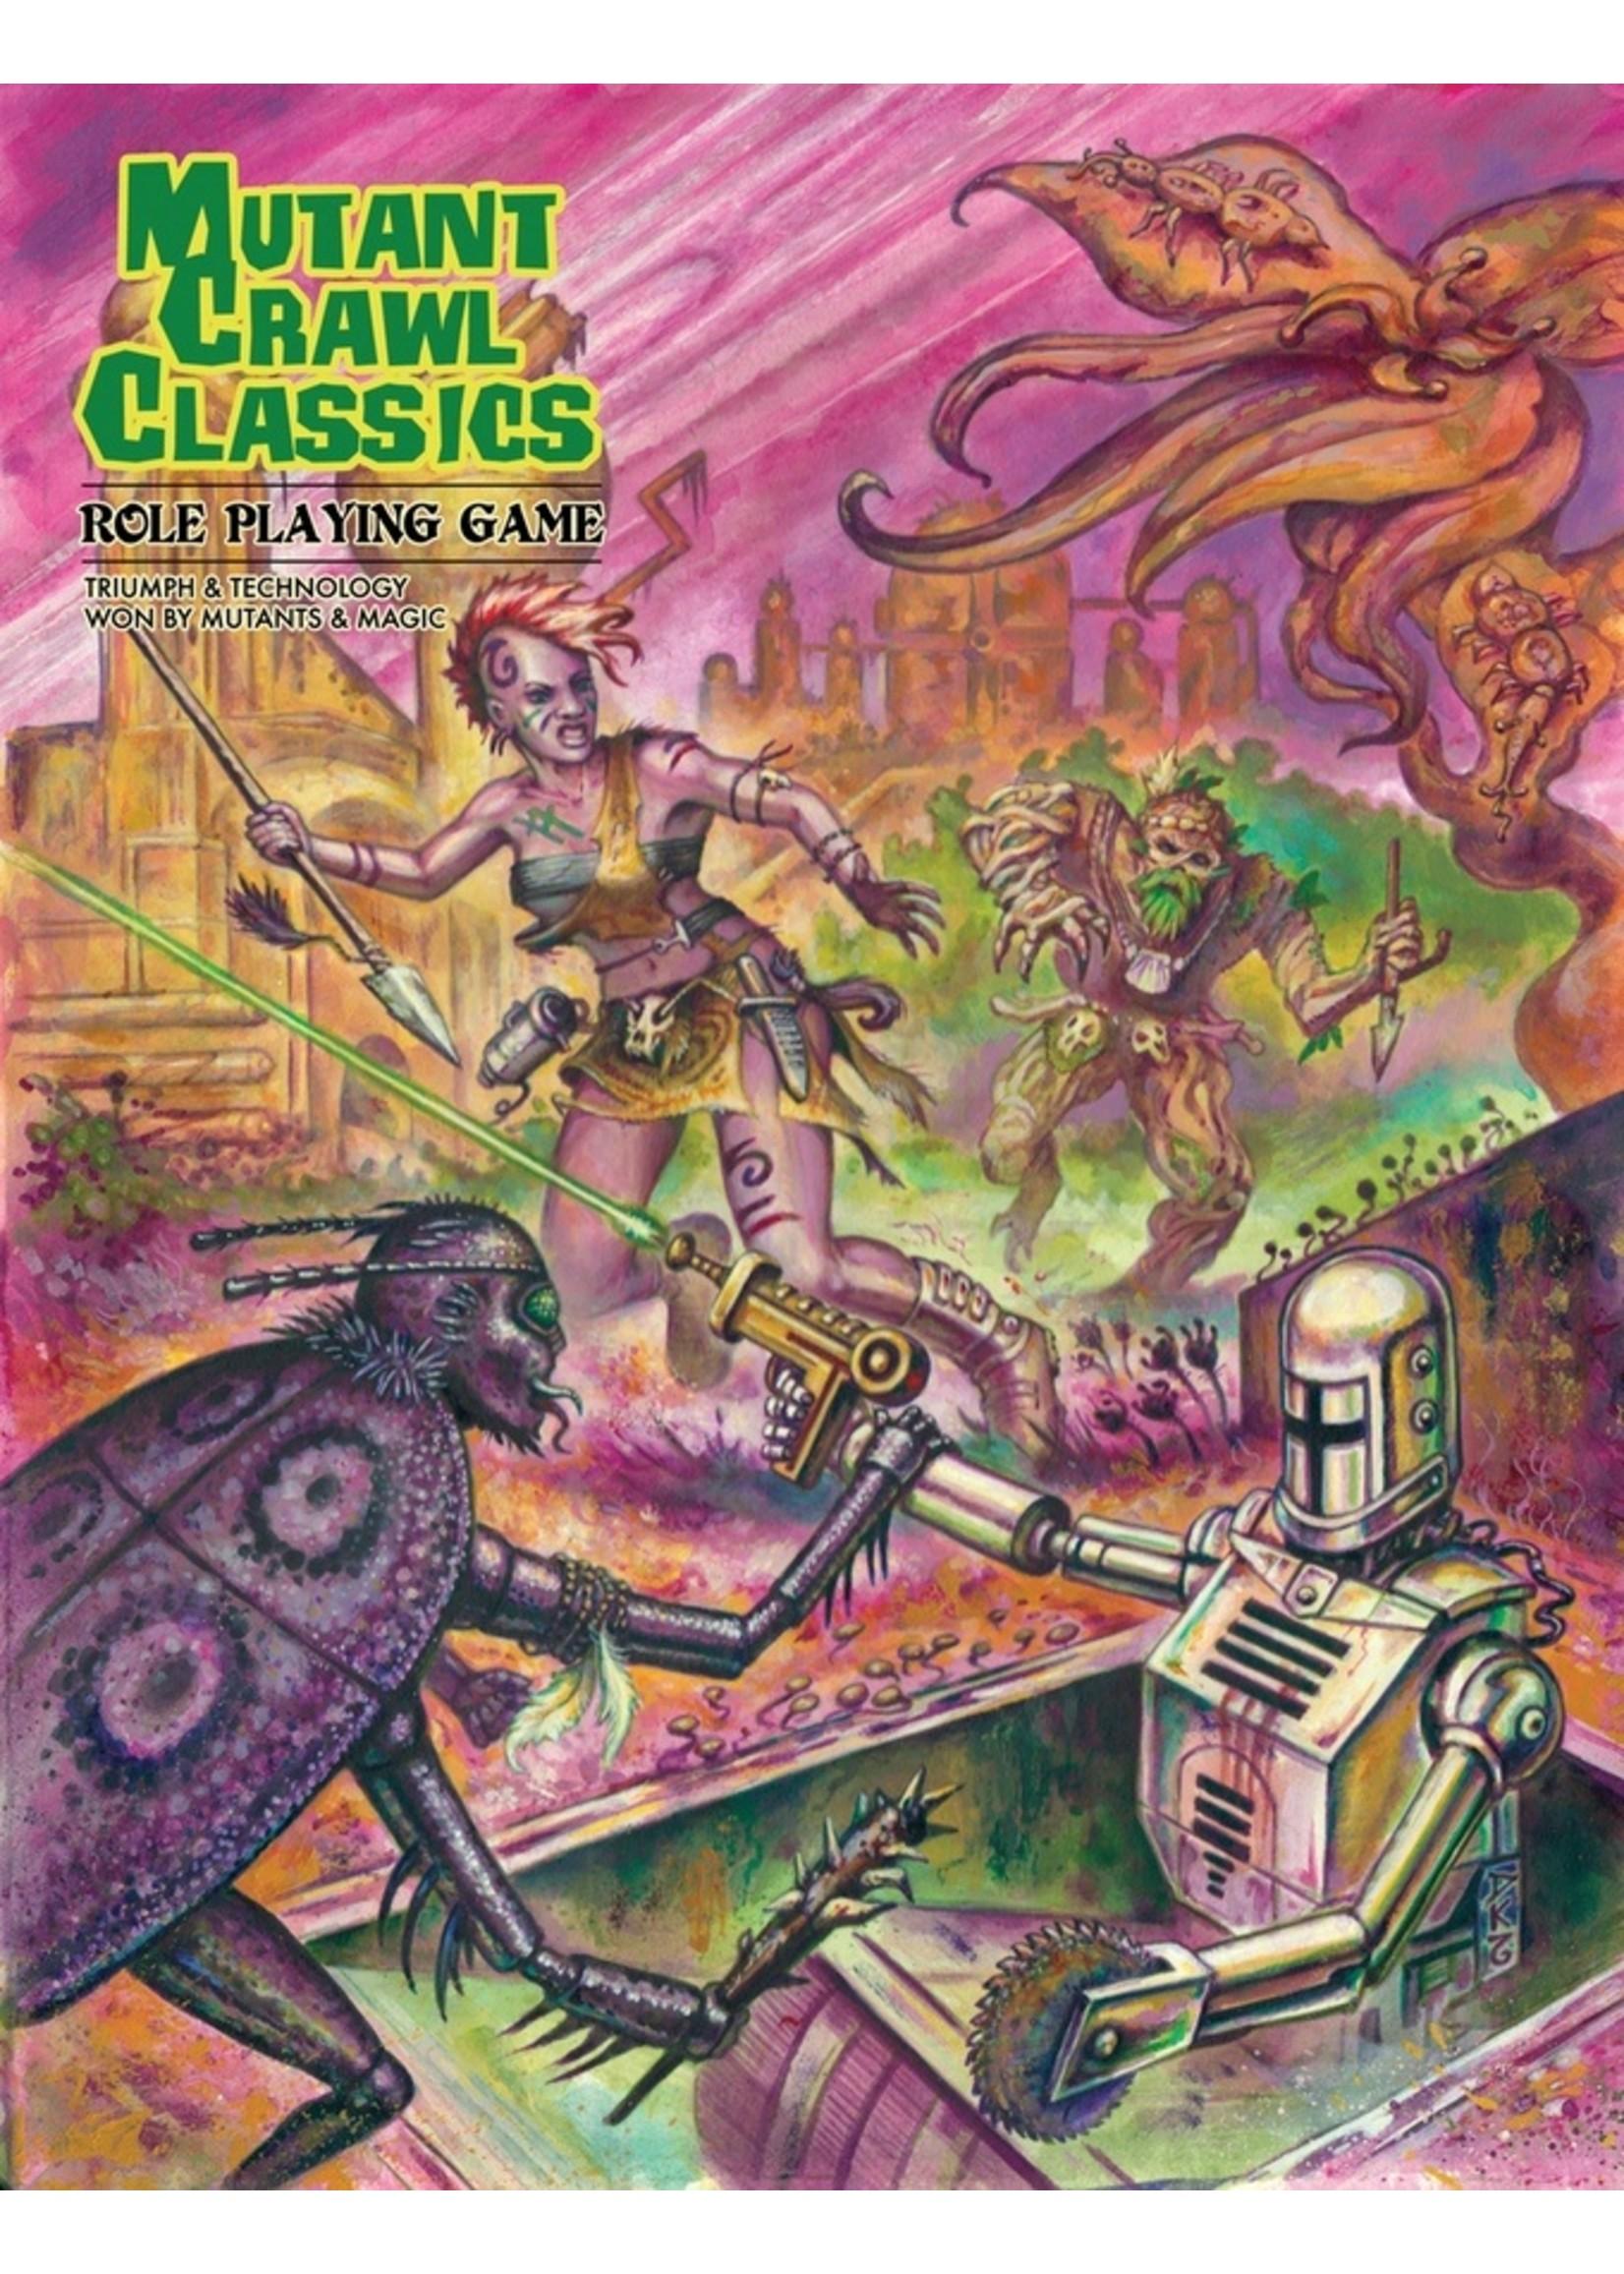 Mutant Crawl Classics RPG